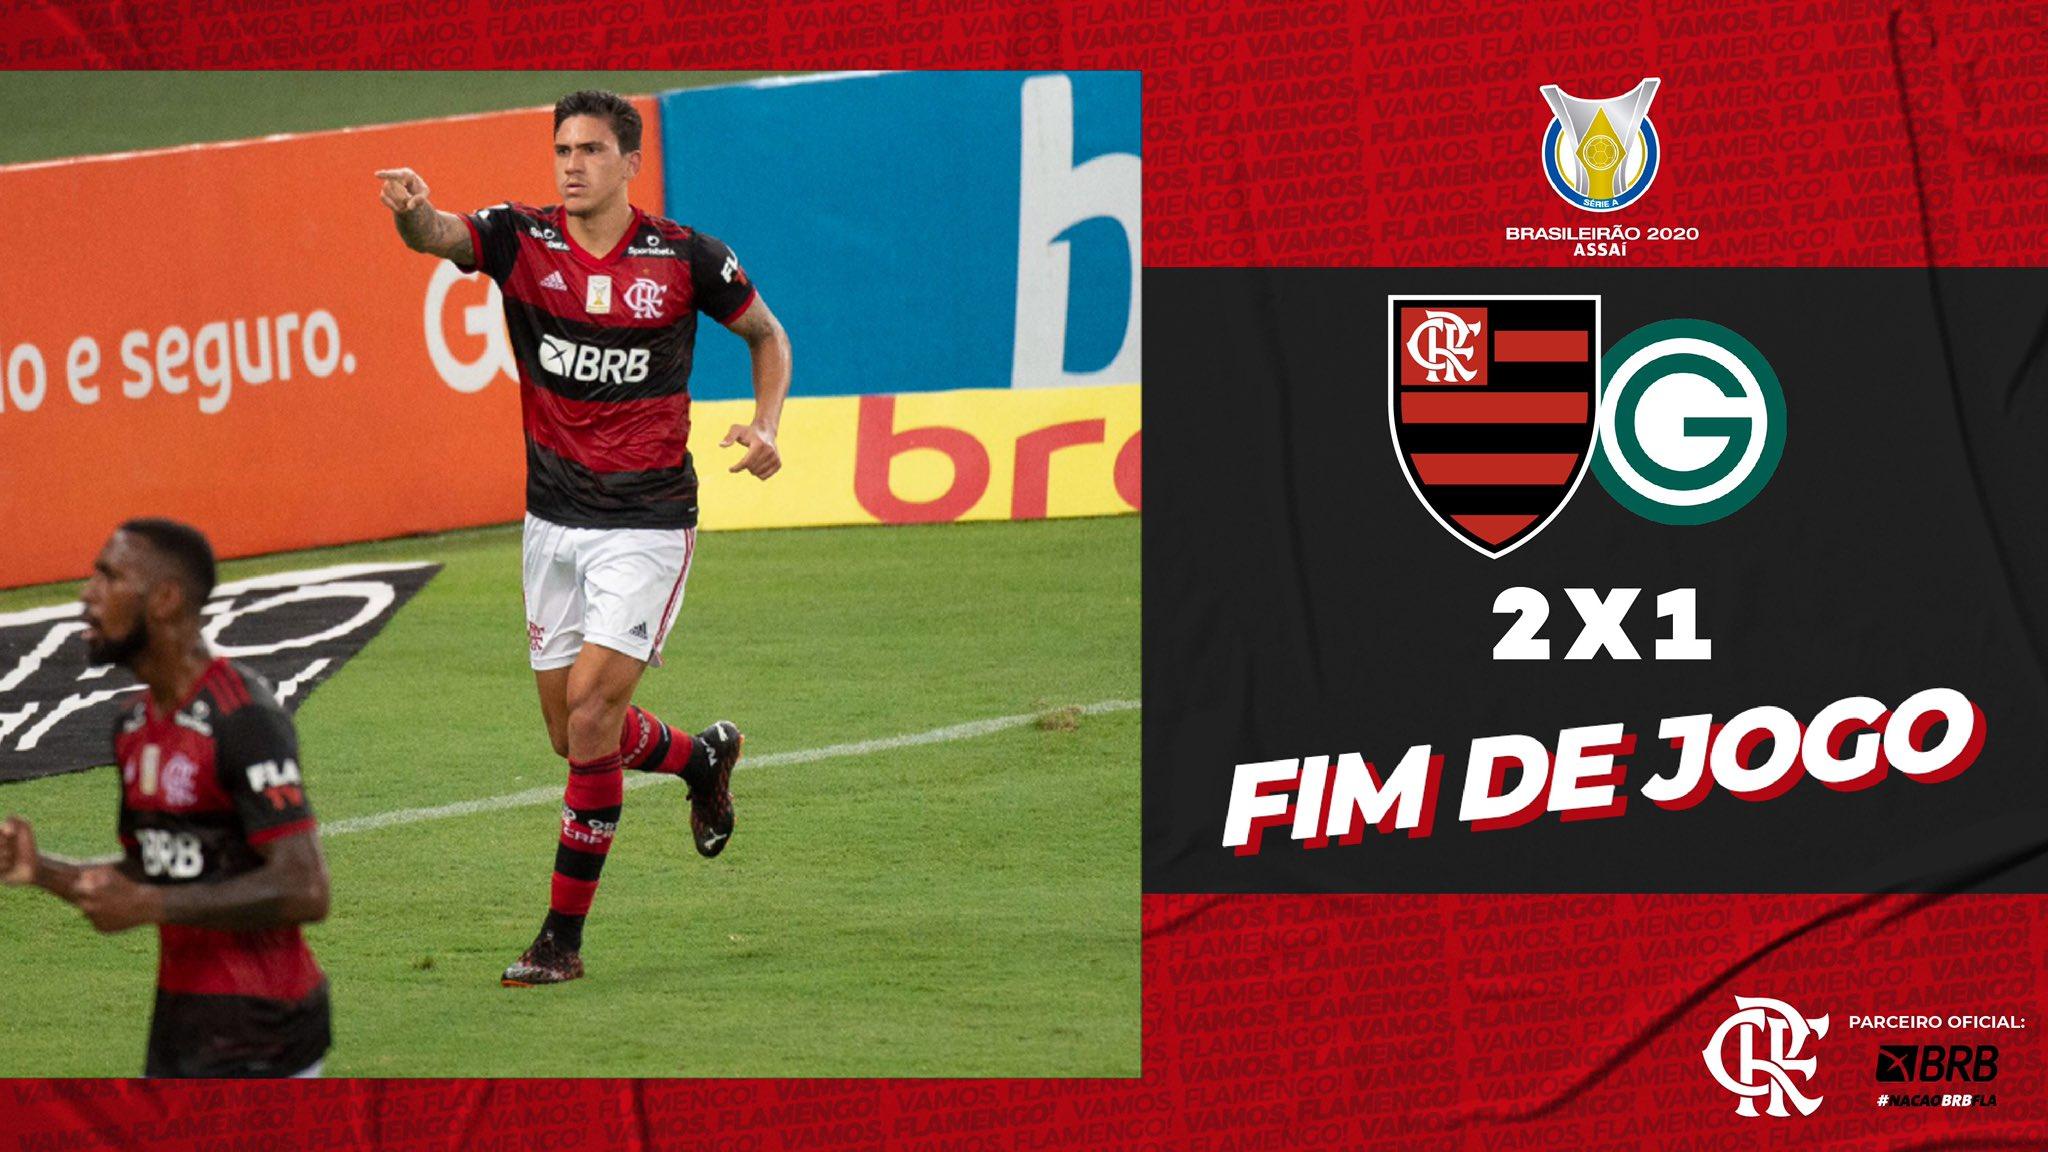 Veja como fica o Flamengo na tabela ap�s a vit�ria no Maracan�